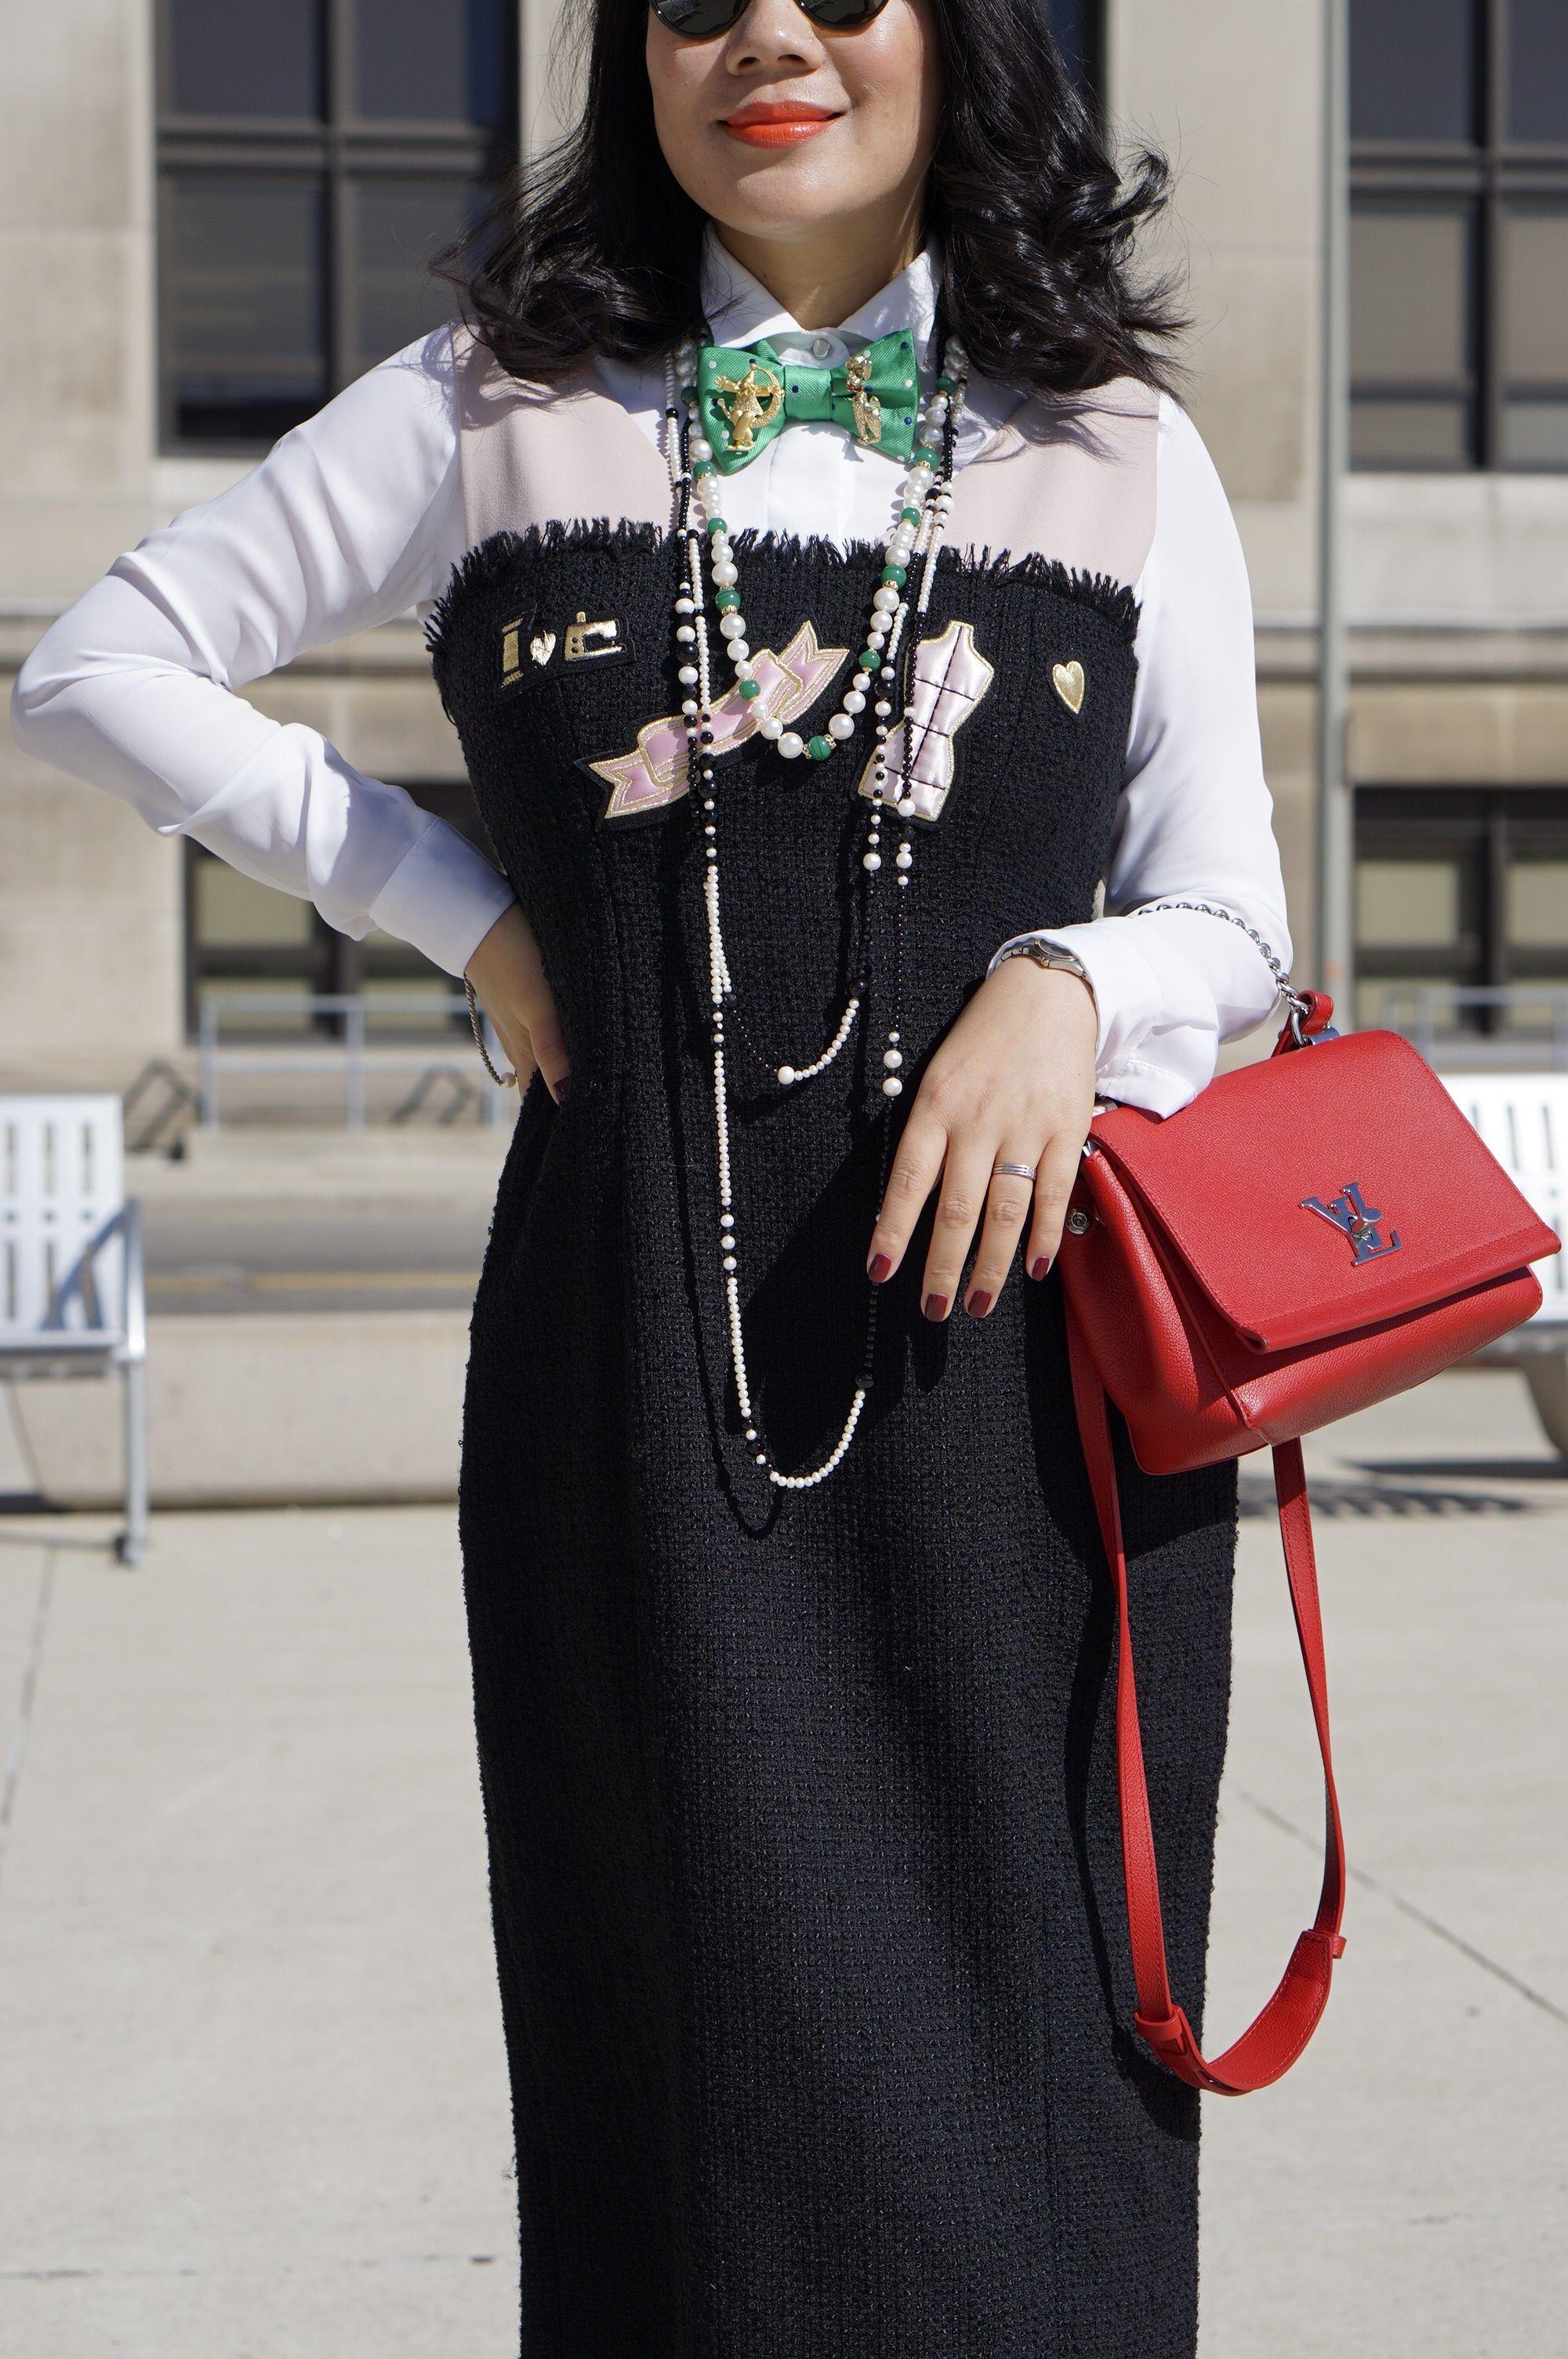 Black dress with red bag - 2016 Petite Spring Fashion Street Style H M White Shirt Moschino Black Dress Aldo Lace